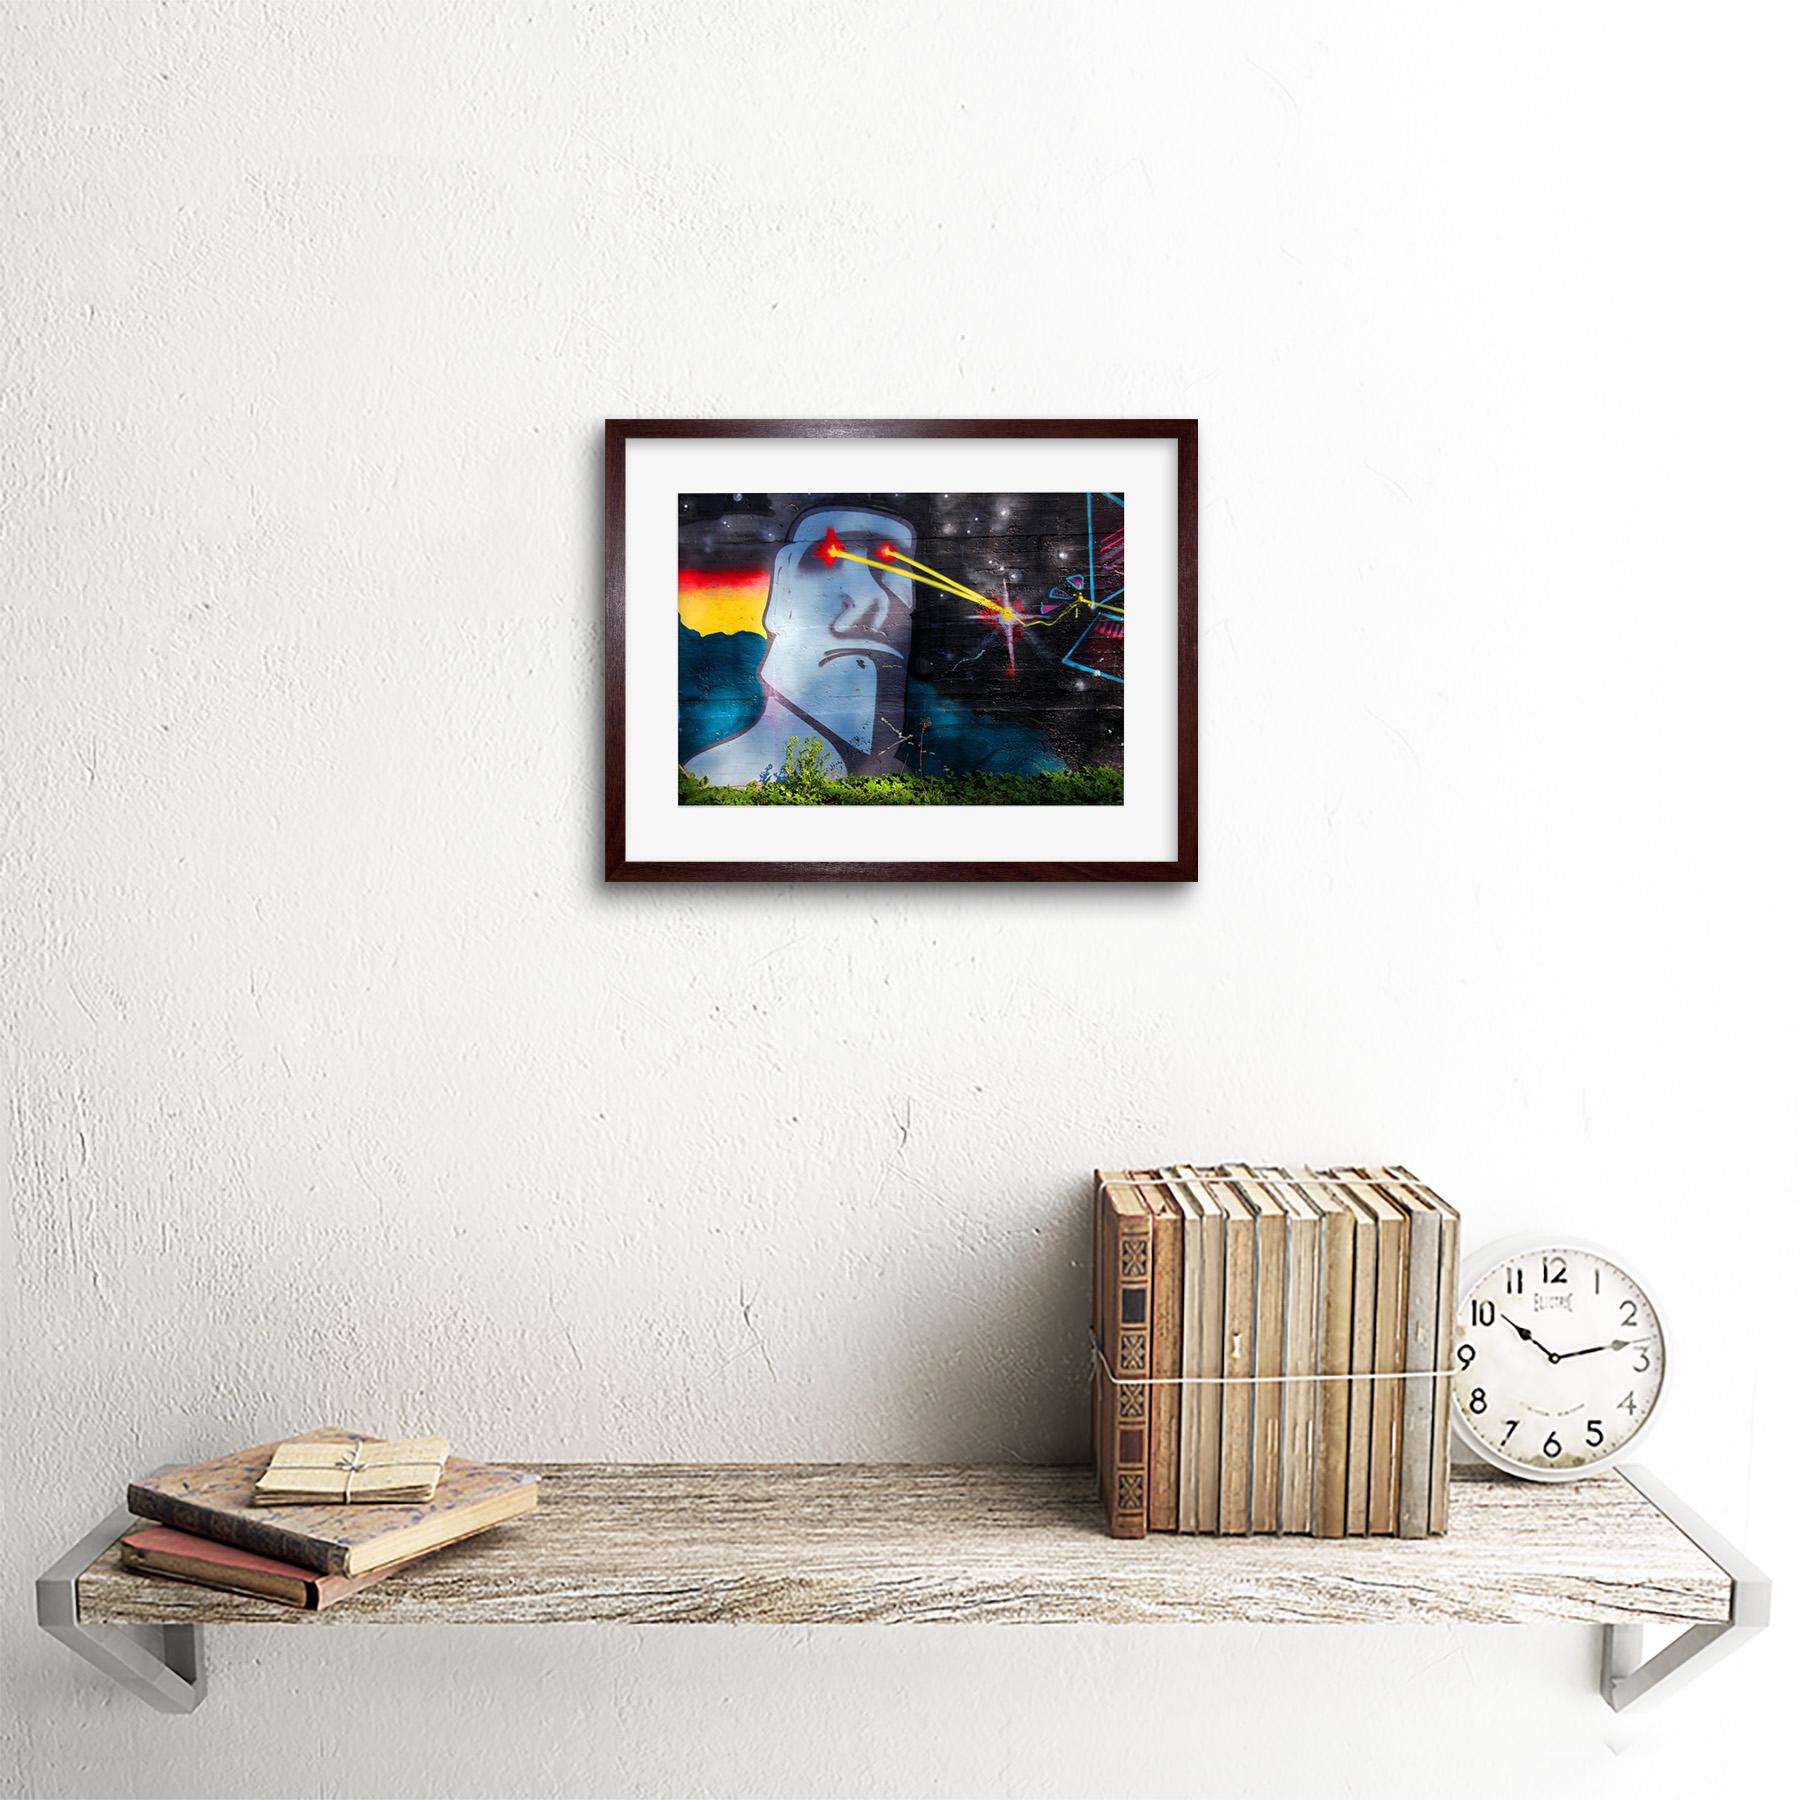 Graffiti-Easter-Island-Head-Laser-Art-Print-Framed-Poster-Wall-Decor miniature 8